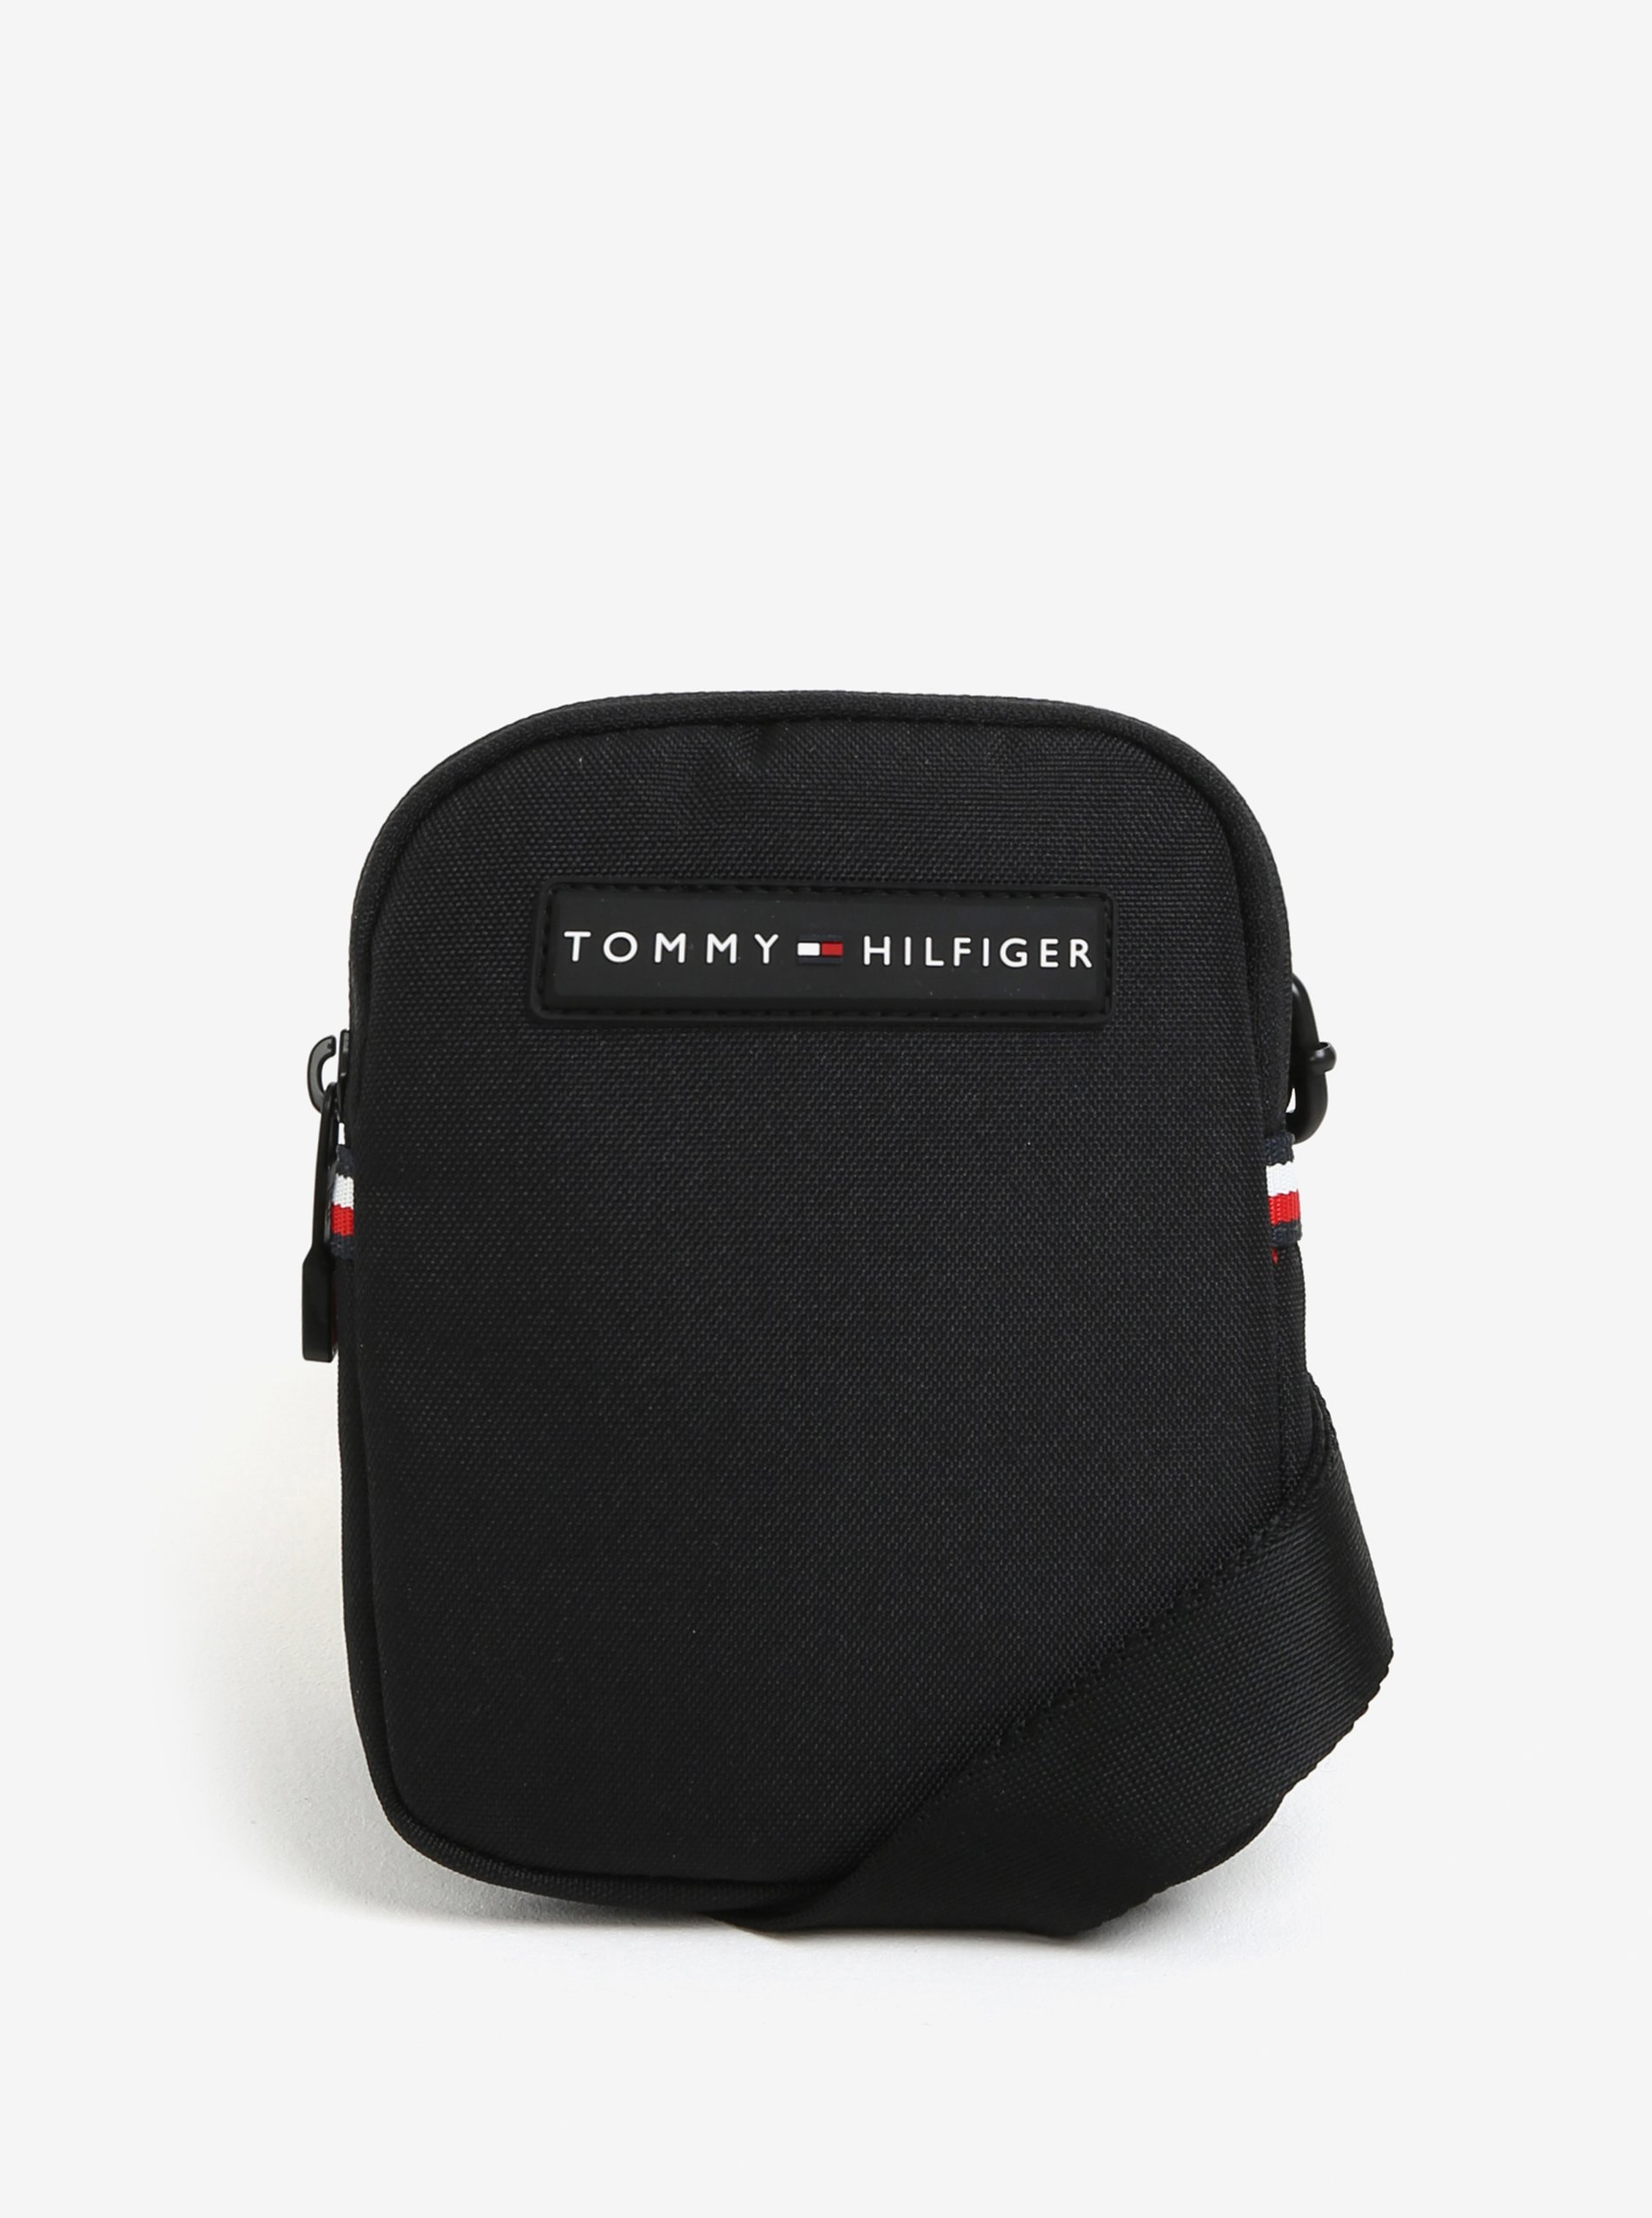 Čierna pánska crossbody taška Tommy Hilfiger Tommy  17d7fb75142